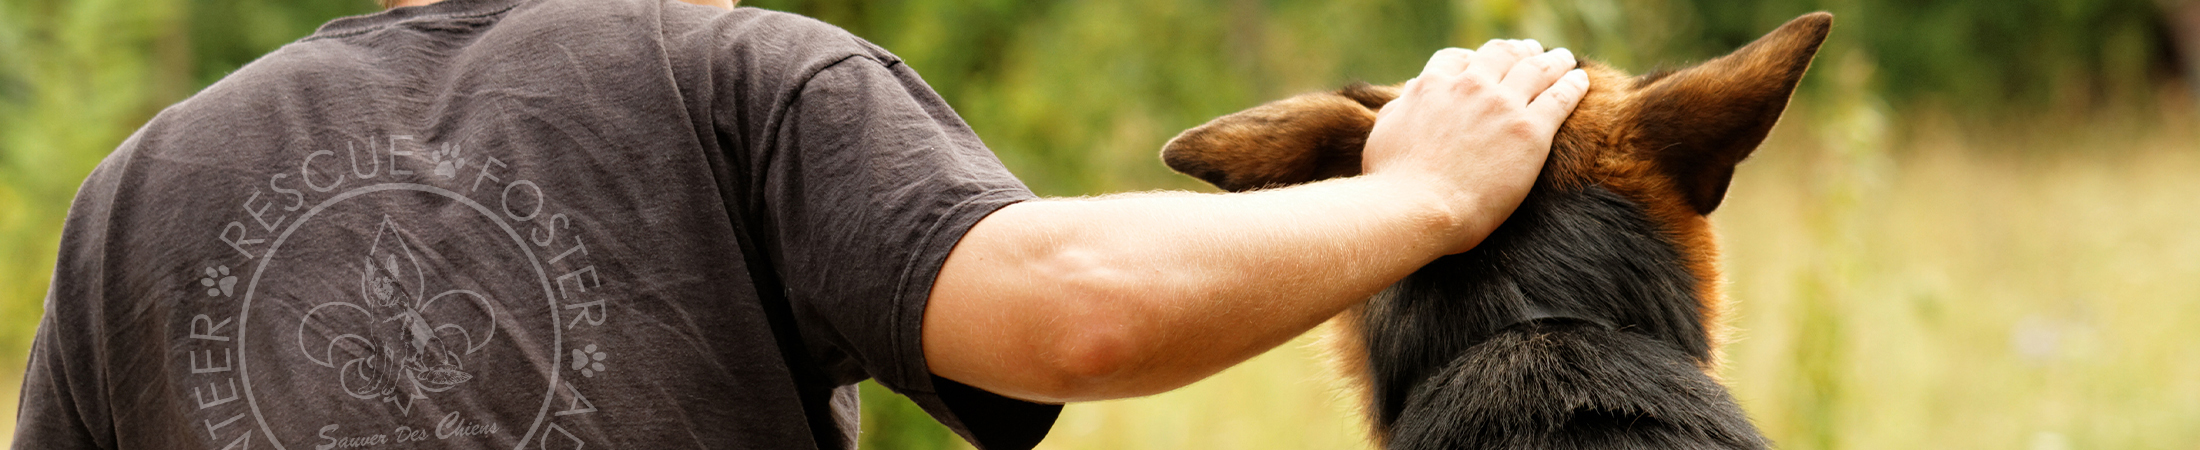 Sauver Des Chiens German Shepherd Dog Rescue